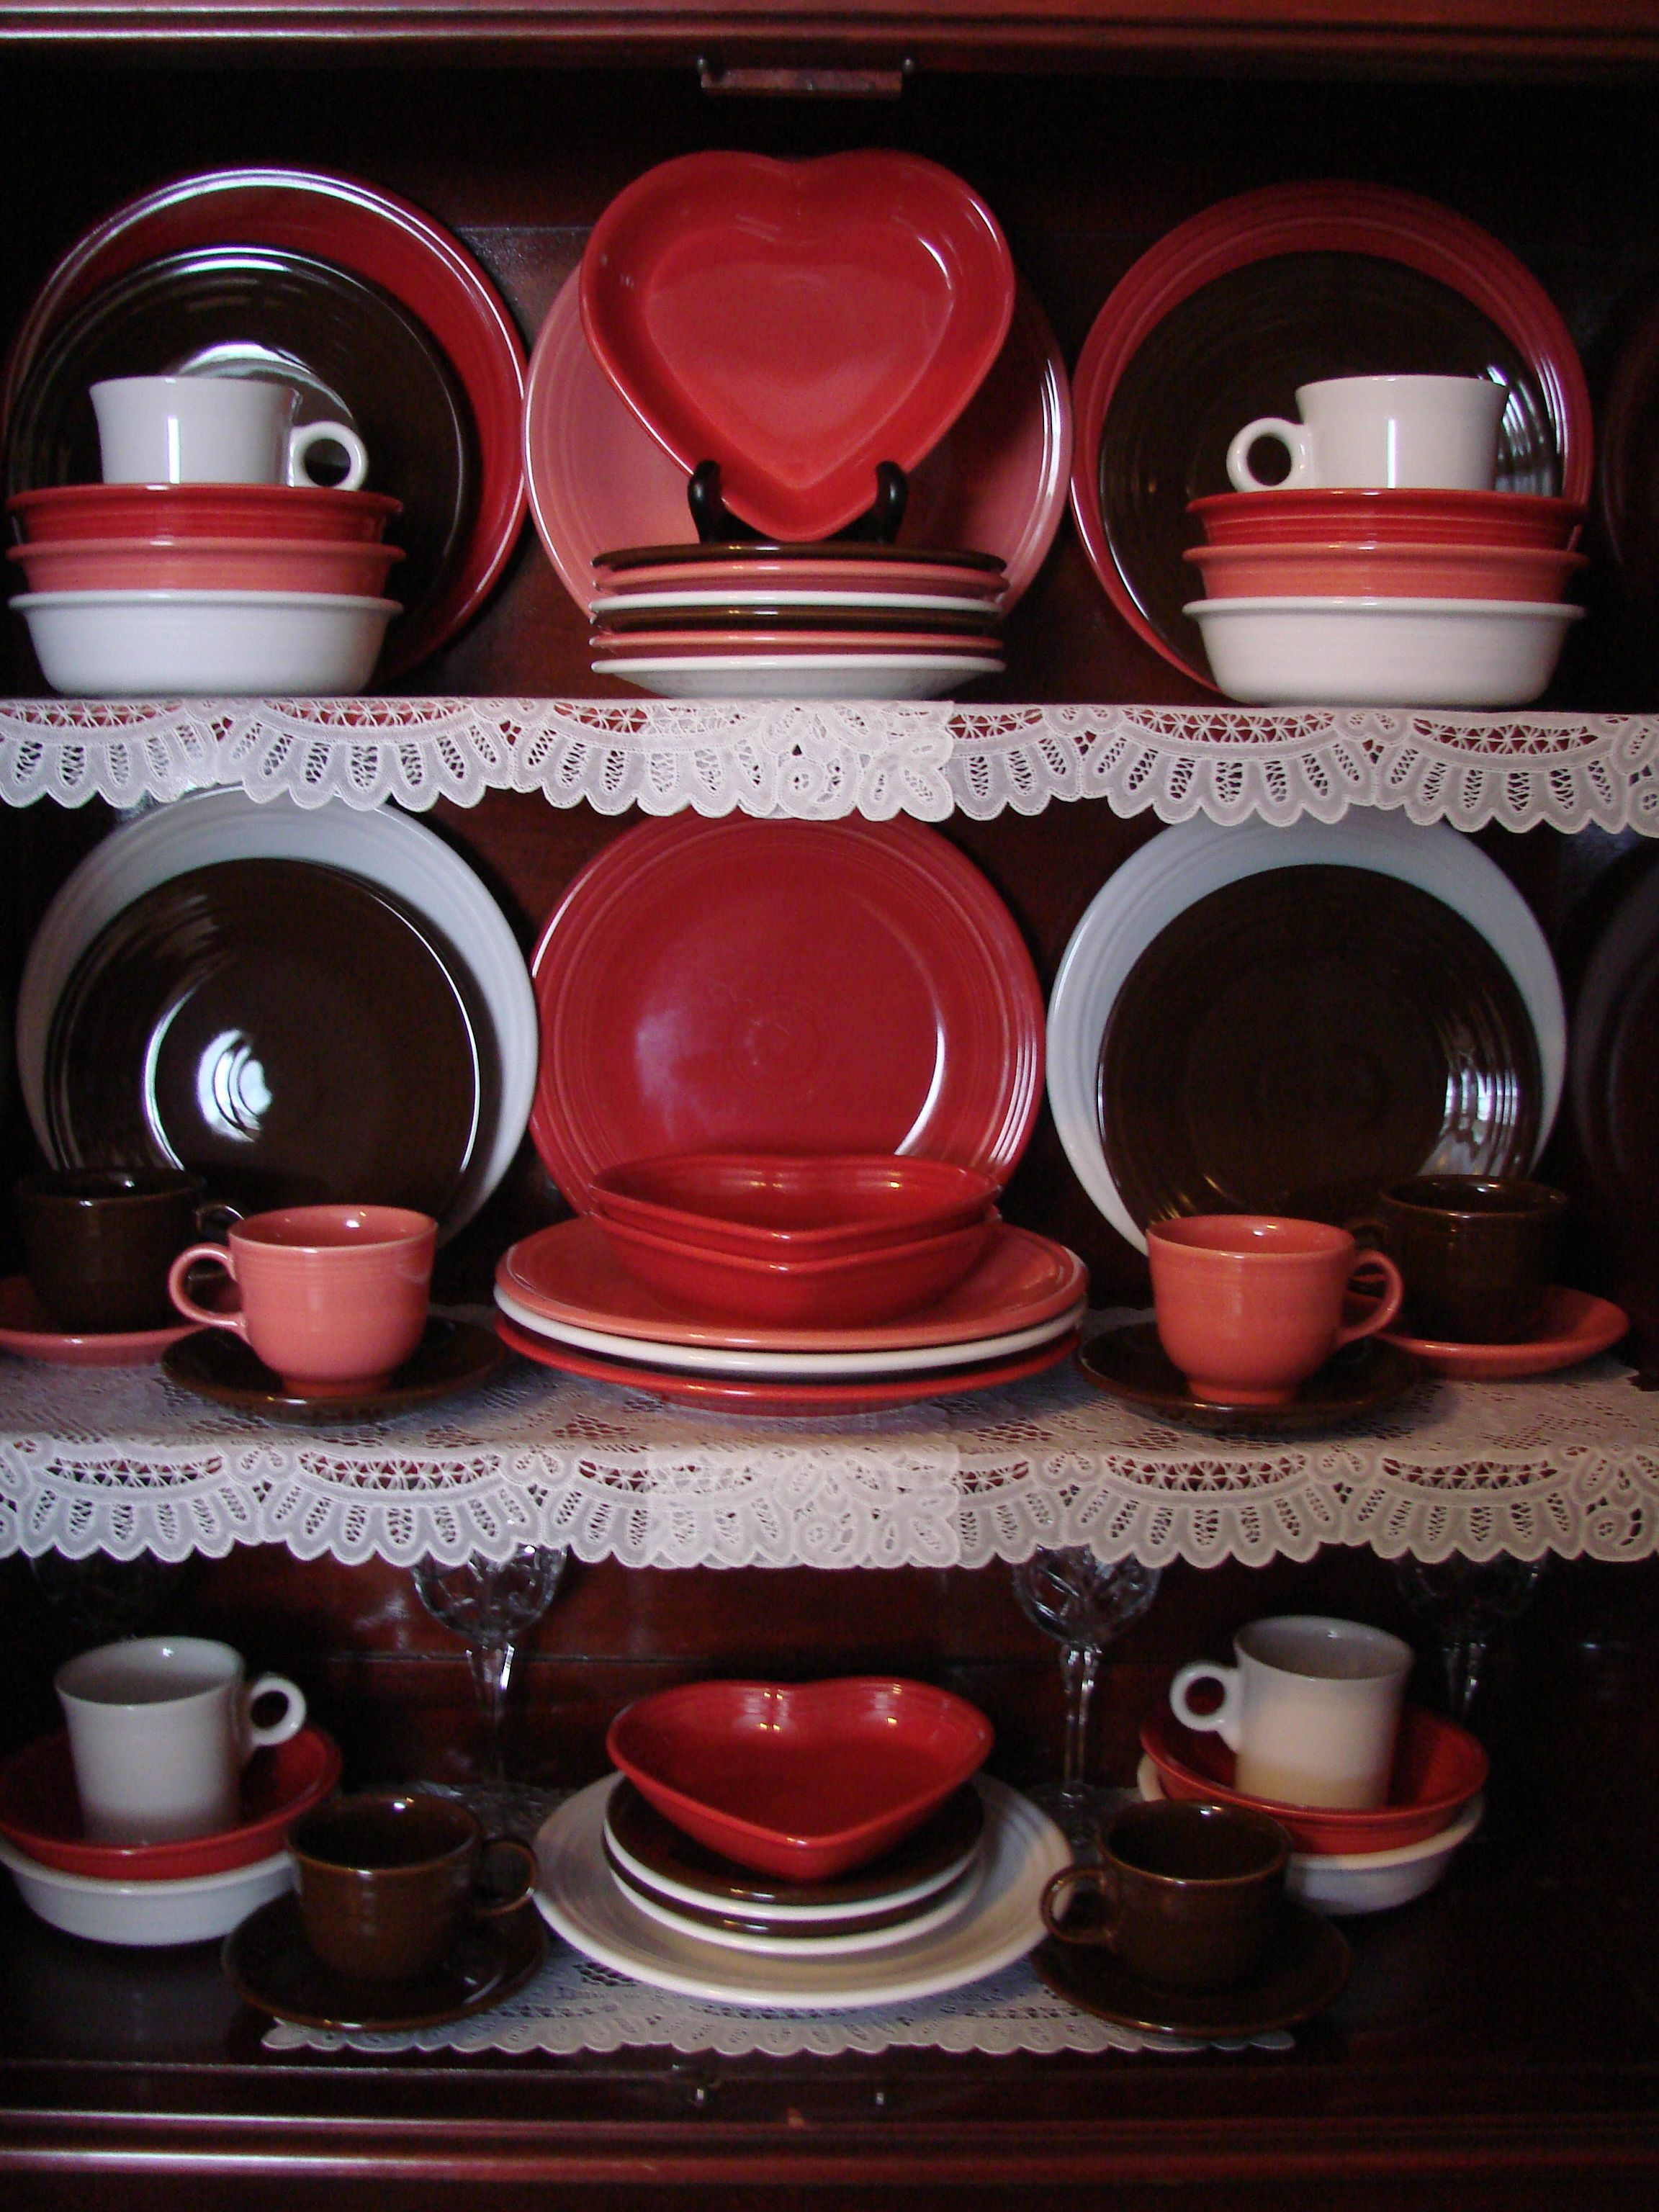 Fiestaware chocolate scarlet flamingo white scarlet heart bowls. A Valentines & Fiestaware chocolate scarlet flamingo white scarlet heart bowls ...